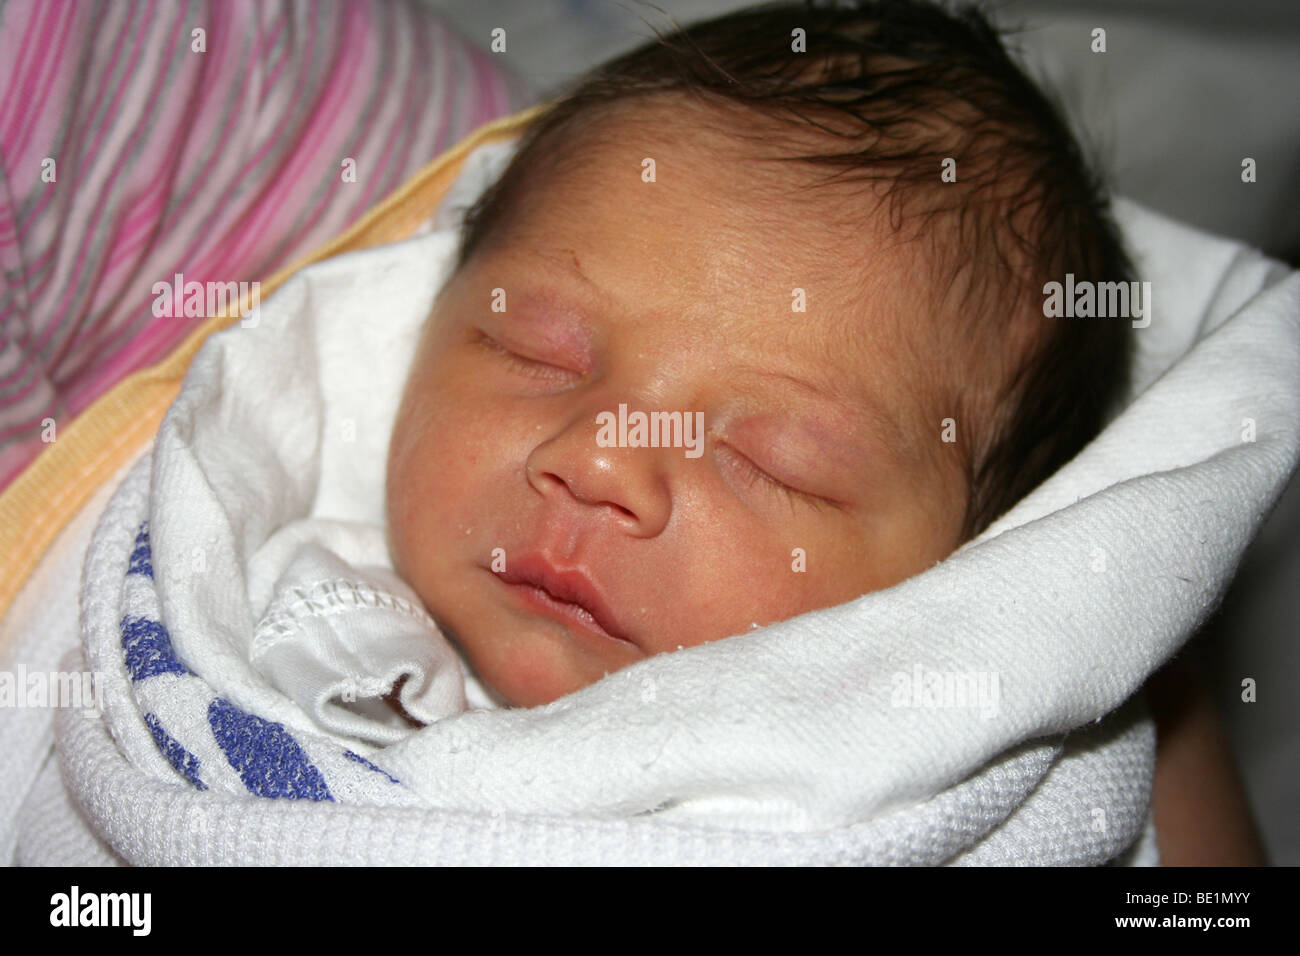 english baby boy stock photos u0026 english baby boy stock images alamy